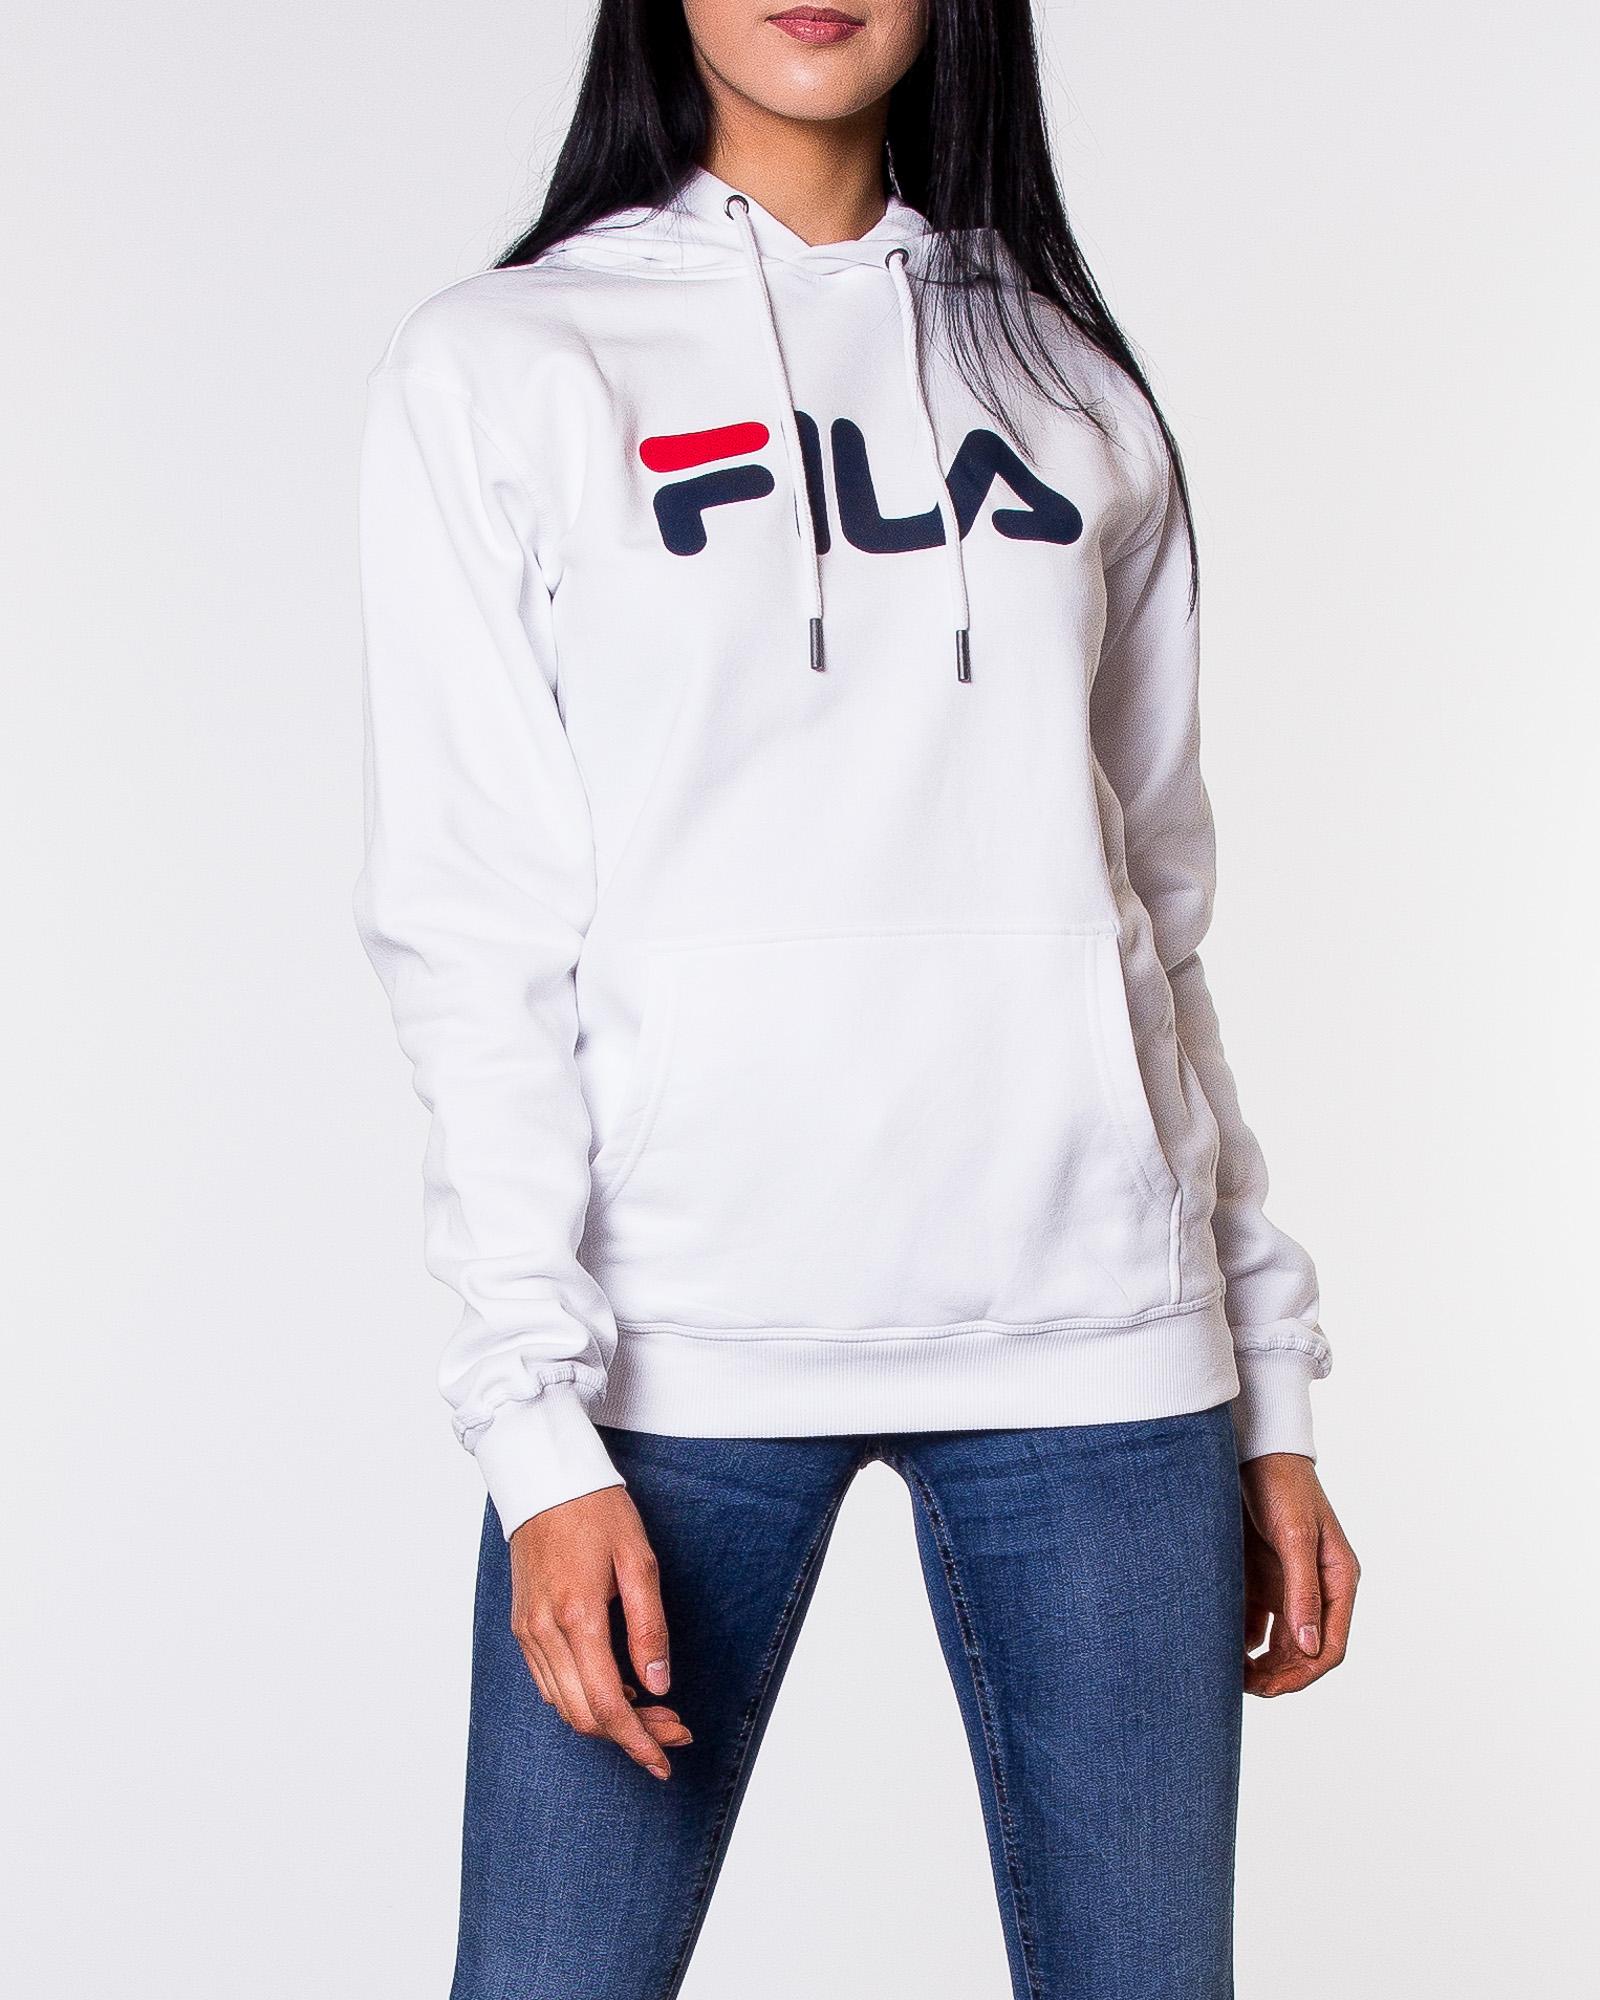 71f8de182c0 Fila, Classic Pure Hoody Bright White | Women's Hoodies ...